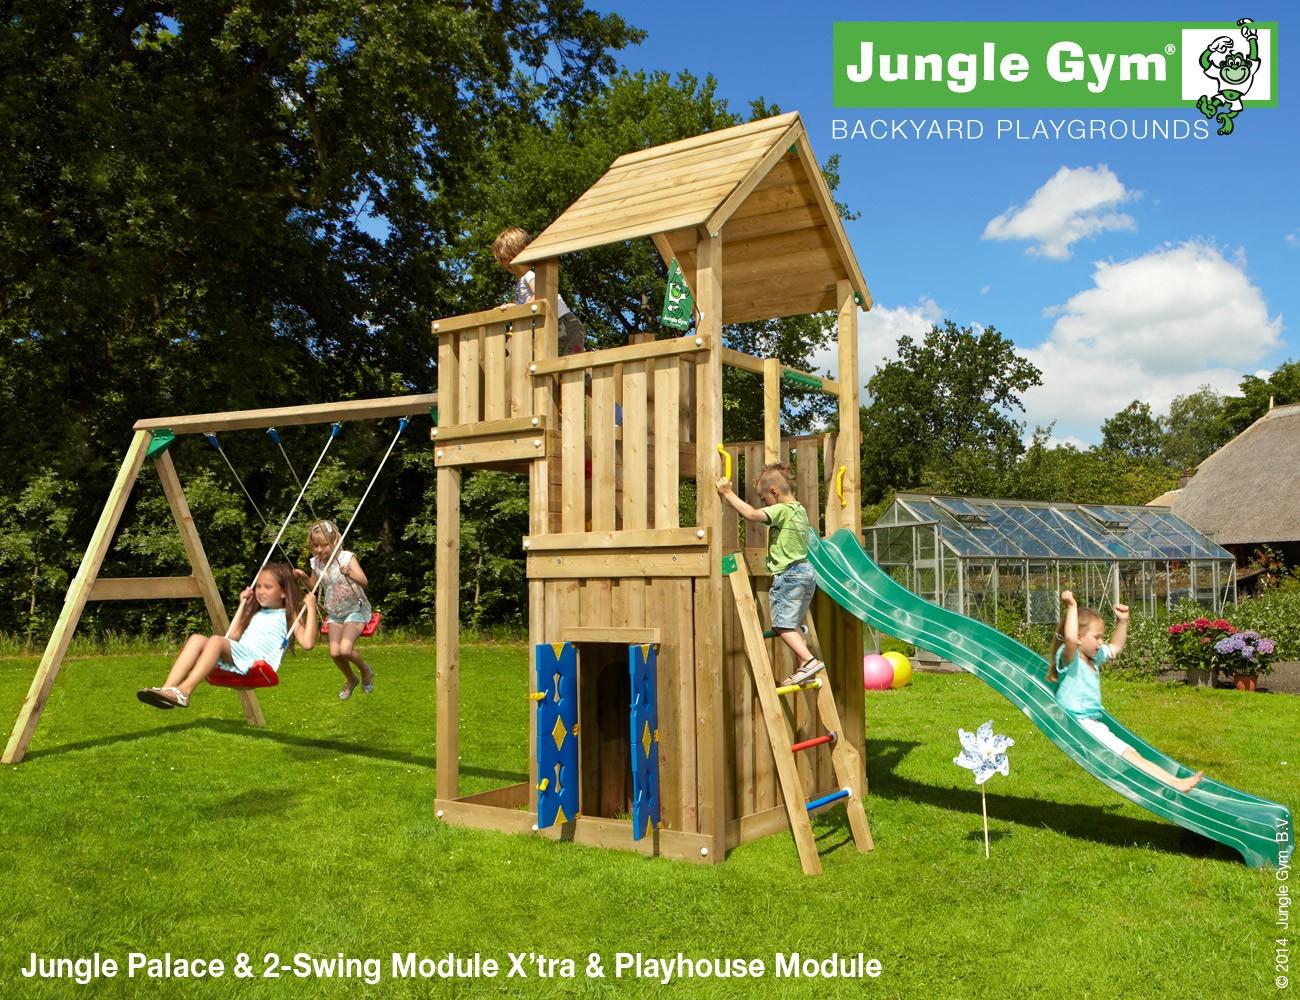 the jungle gym palace playhouse 2 swing climbing frame climbing